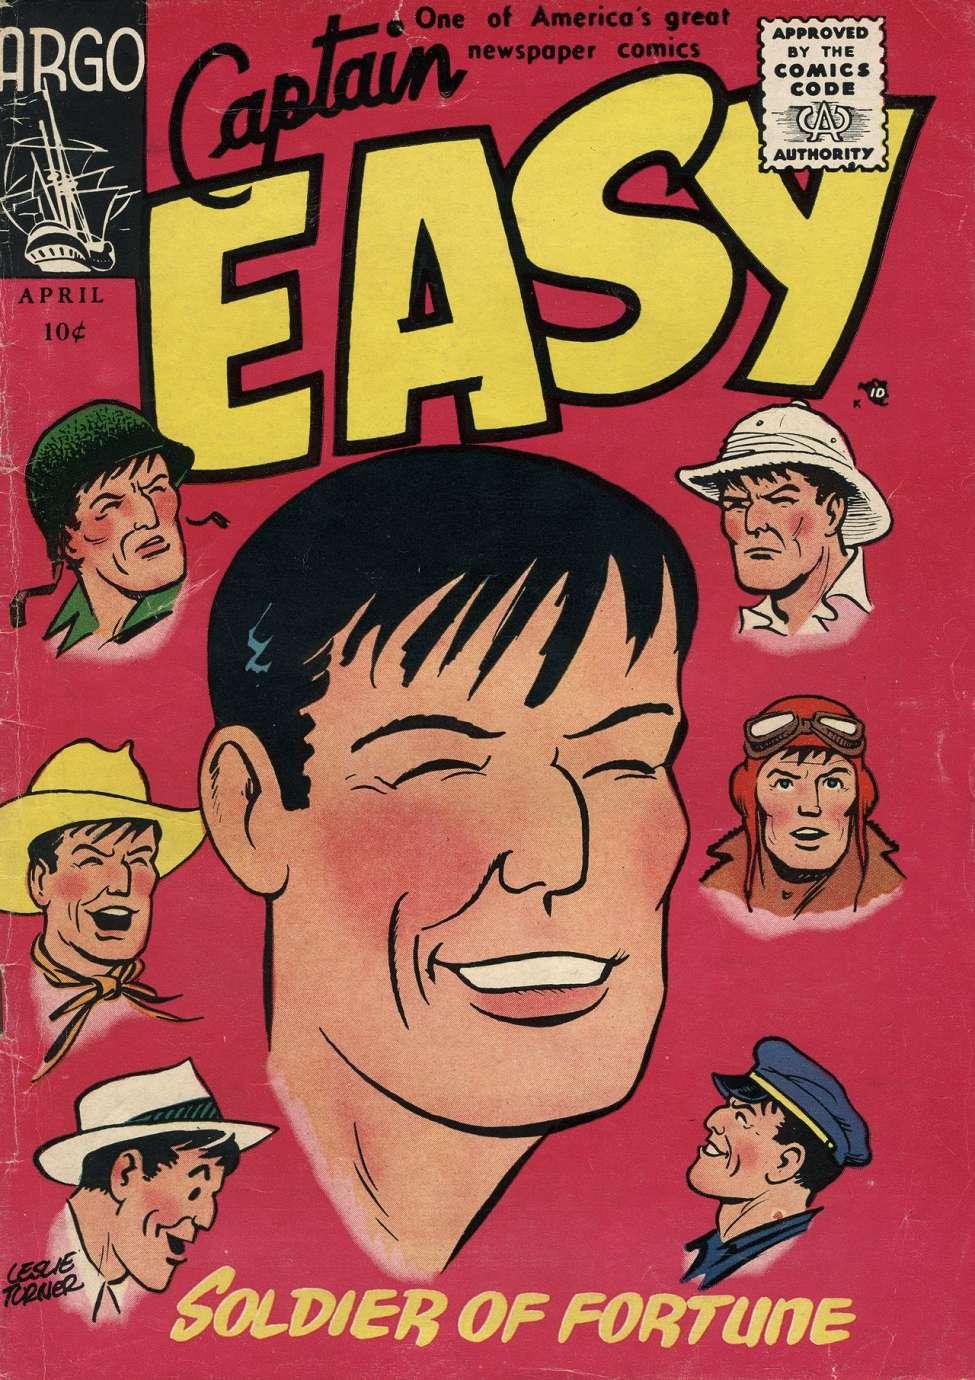 Simple Comic Book Covers ~ Captain easy argo publications comic book plus